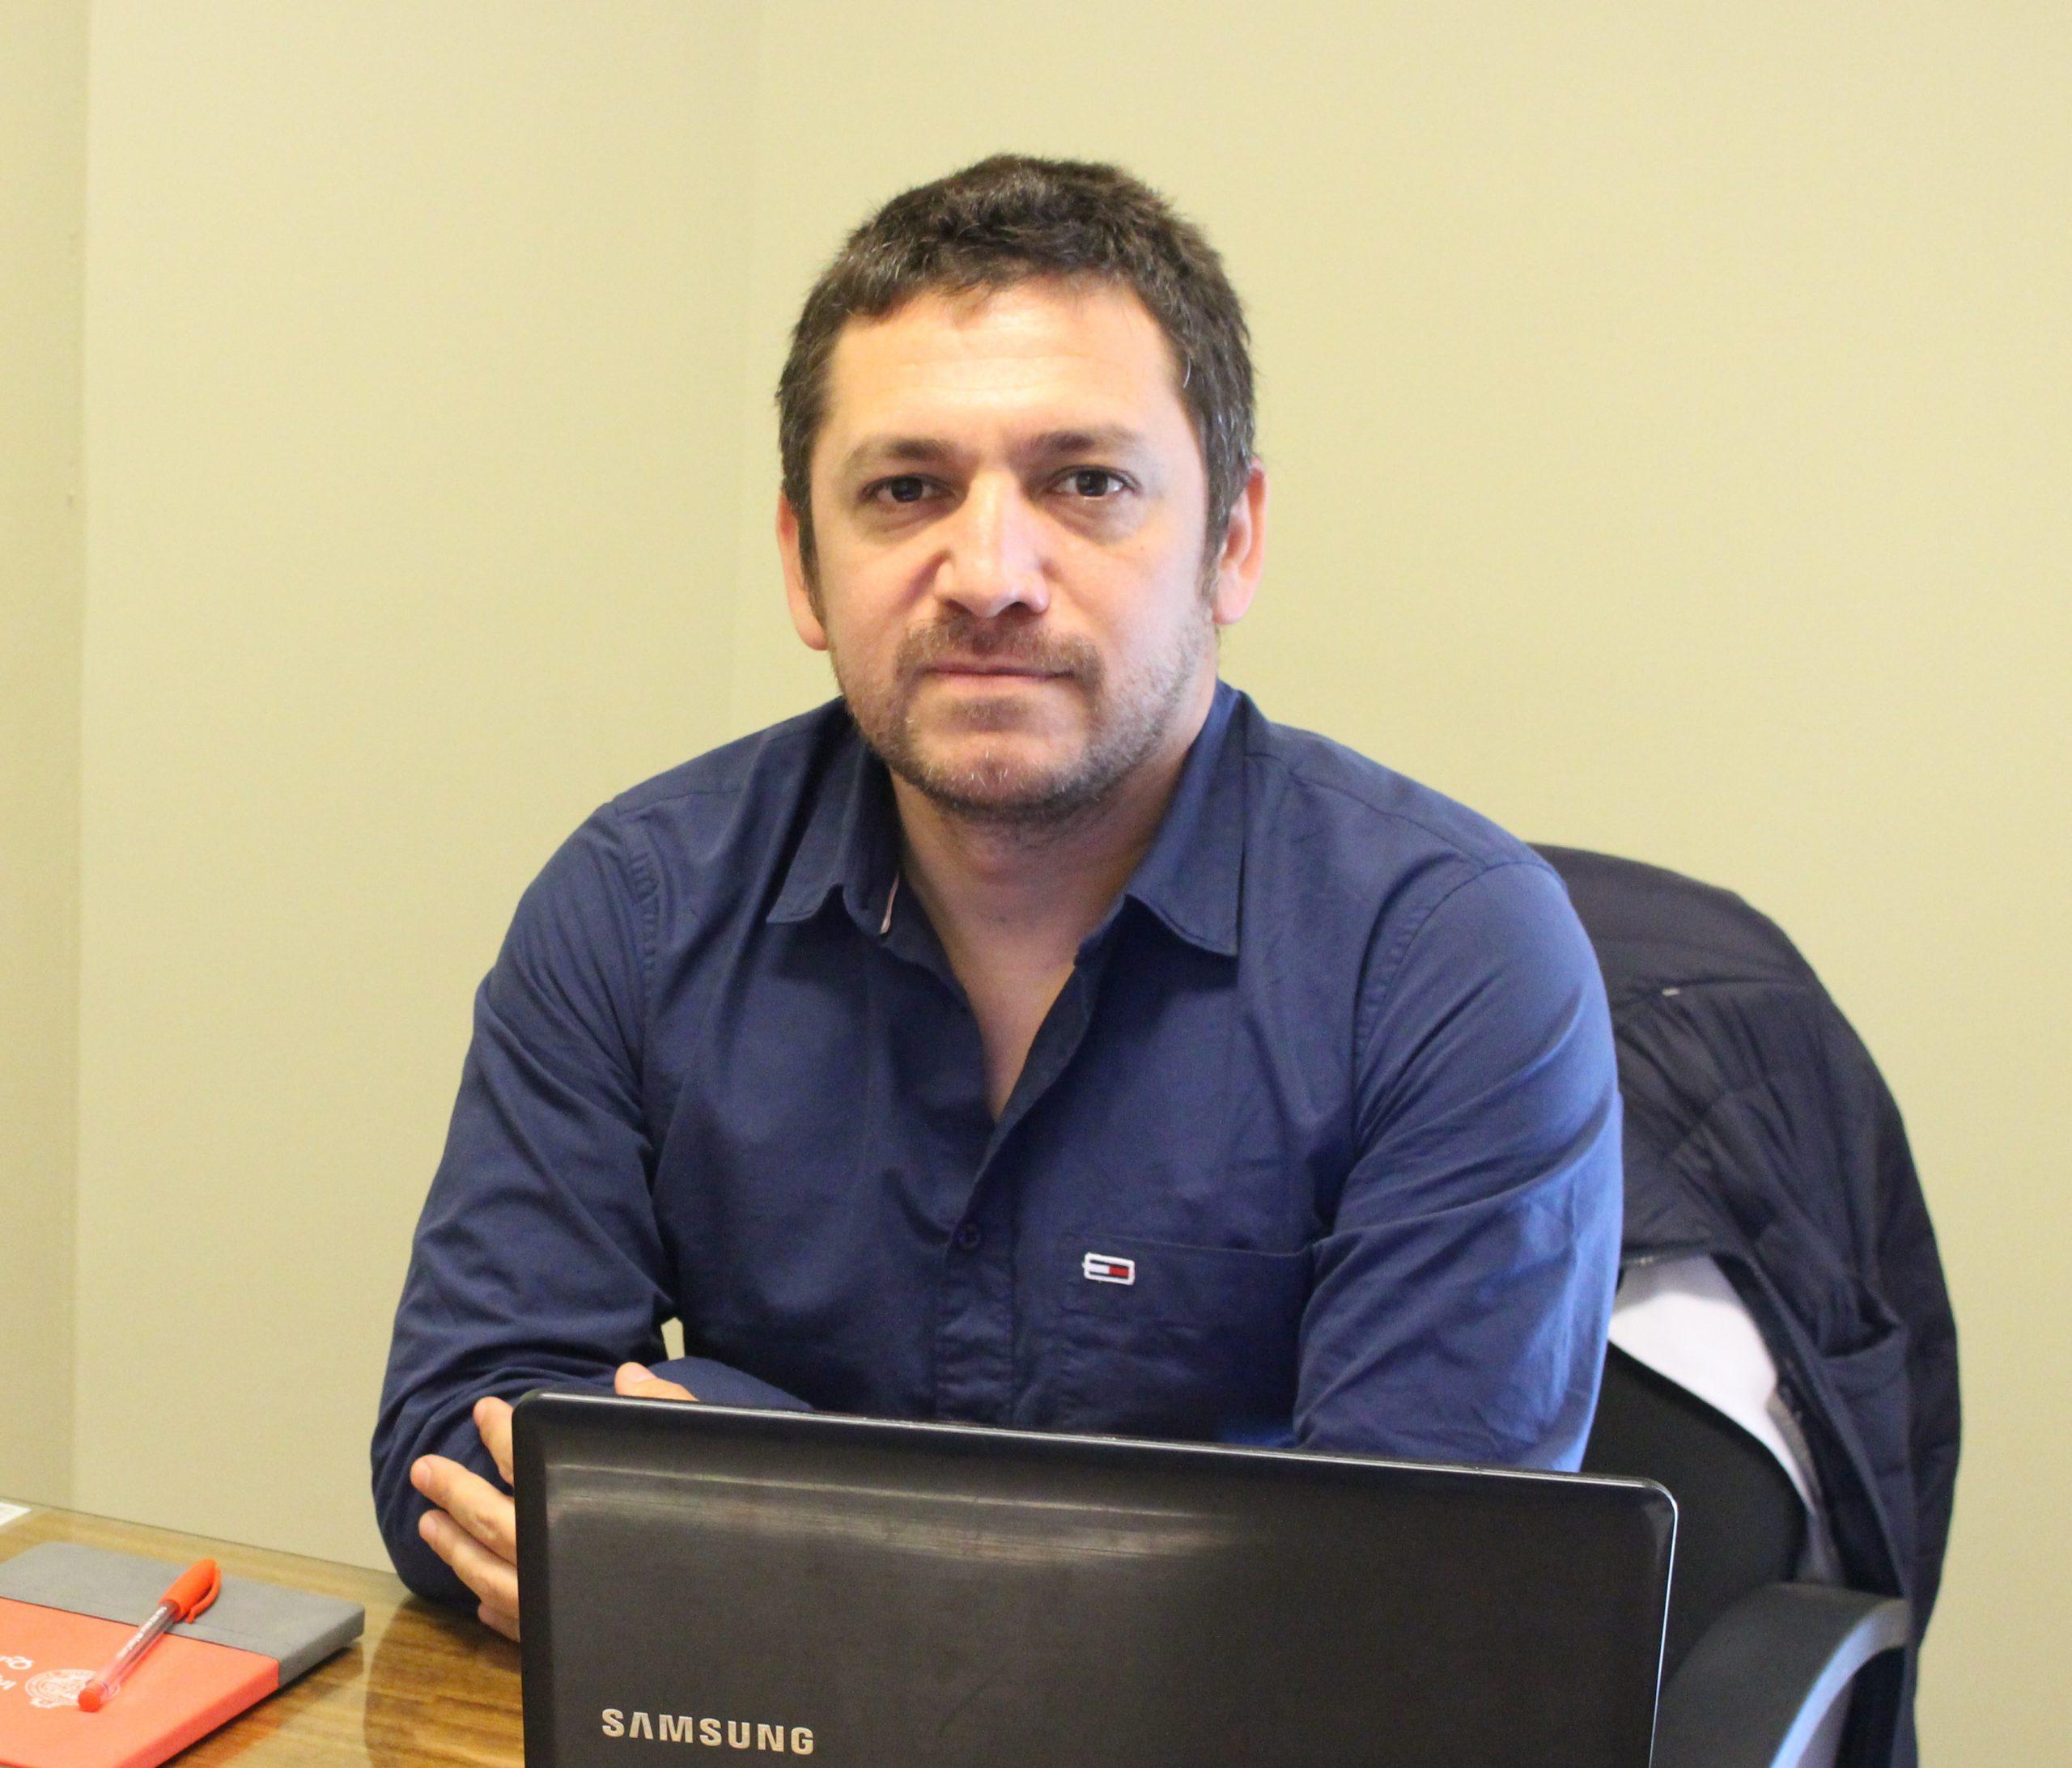 Marcelo León Martínez